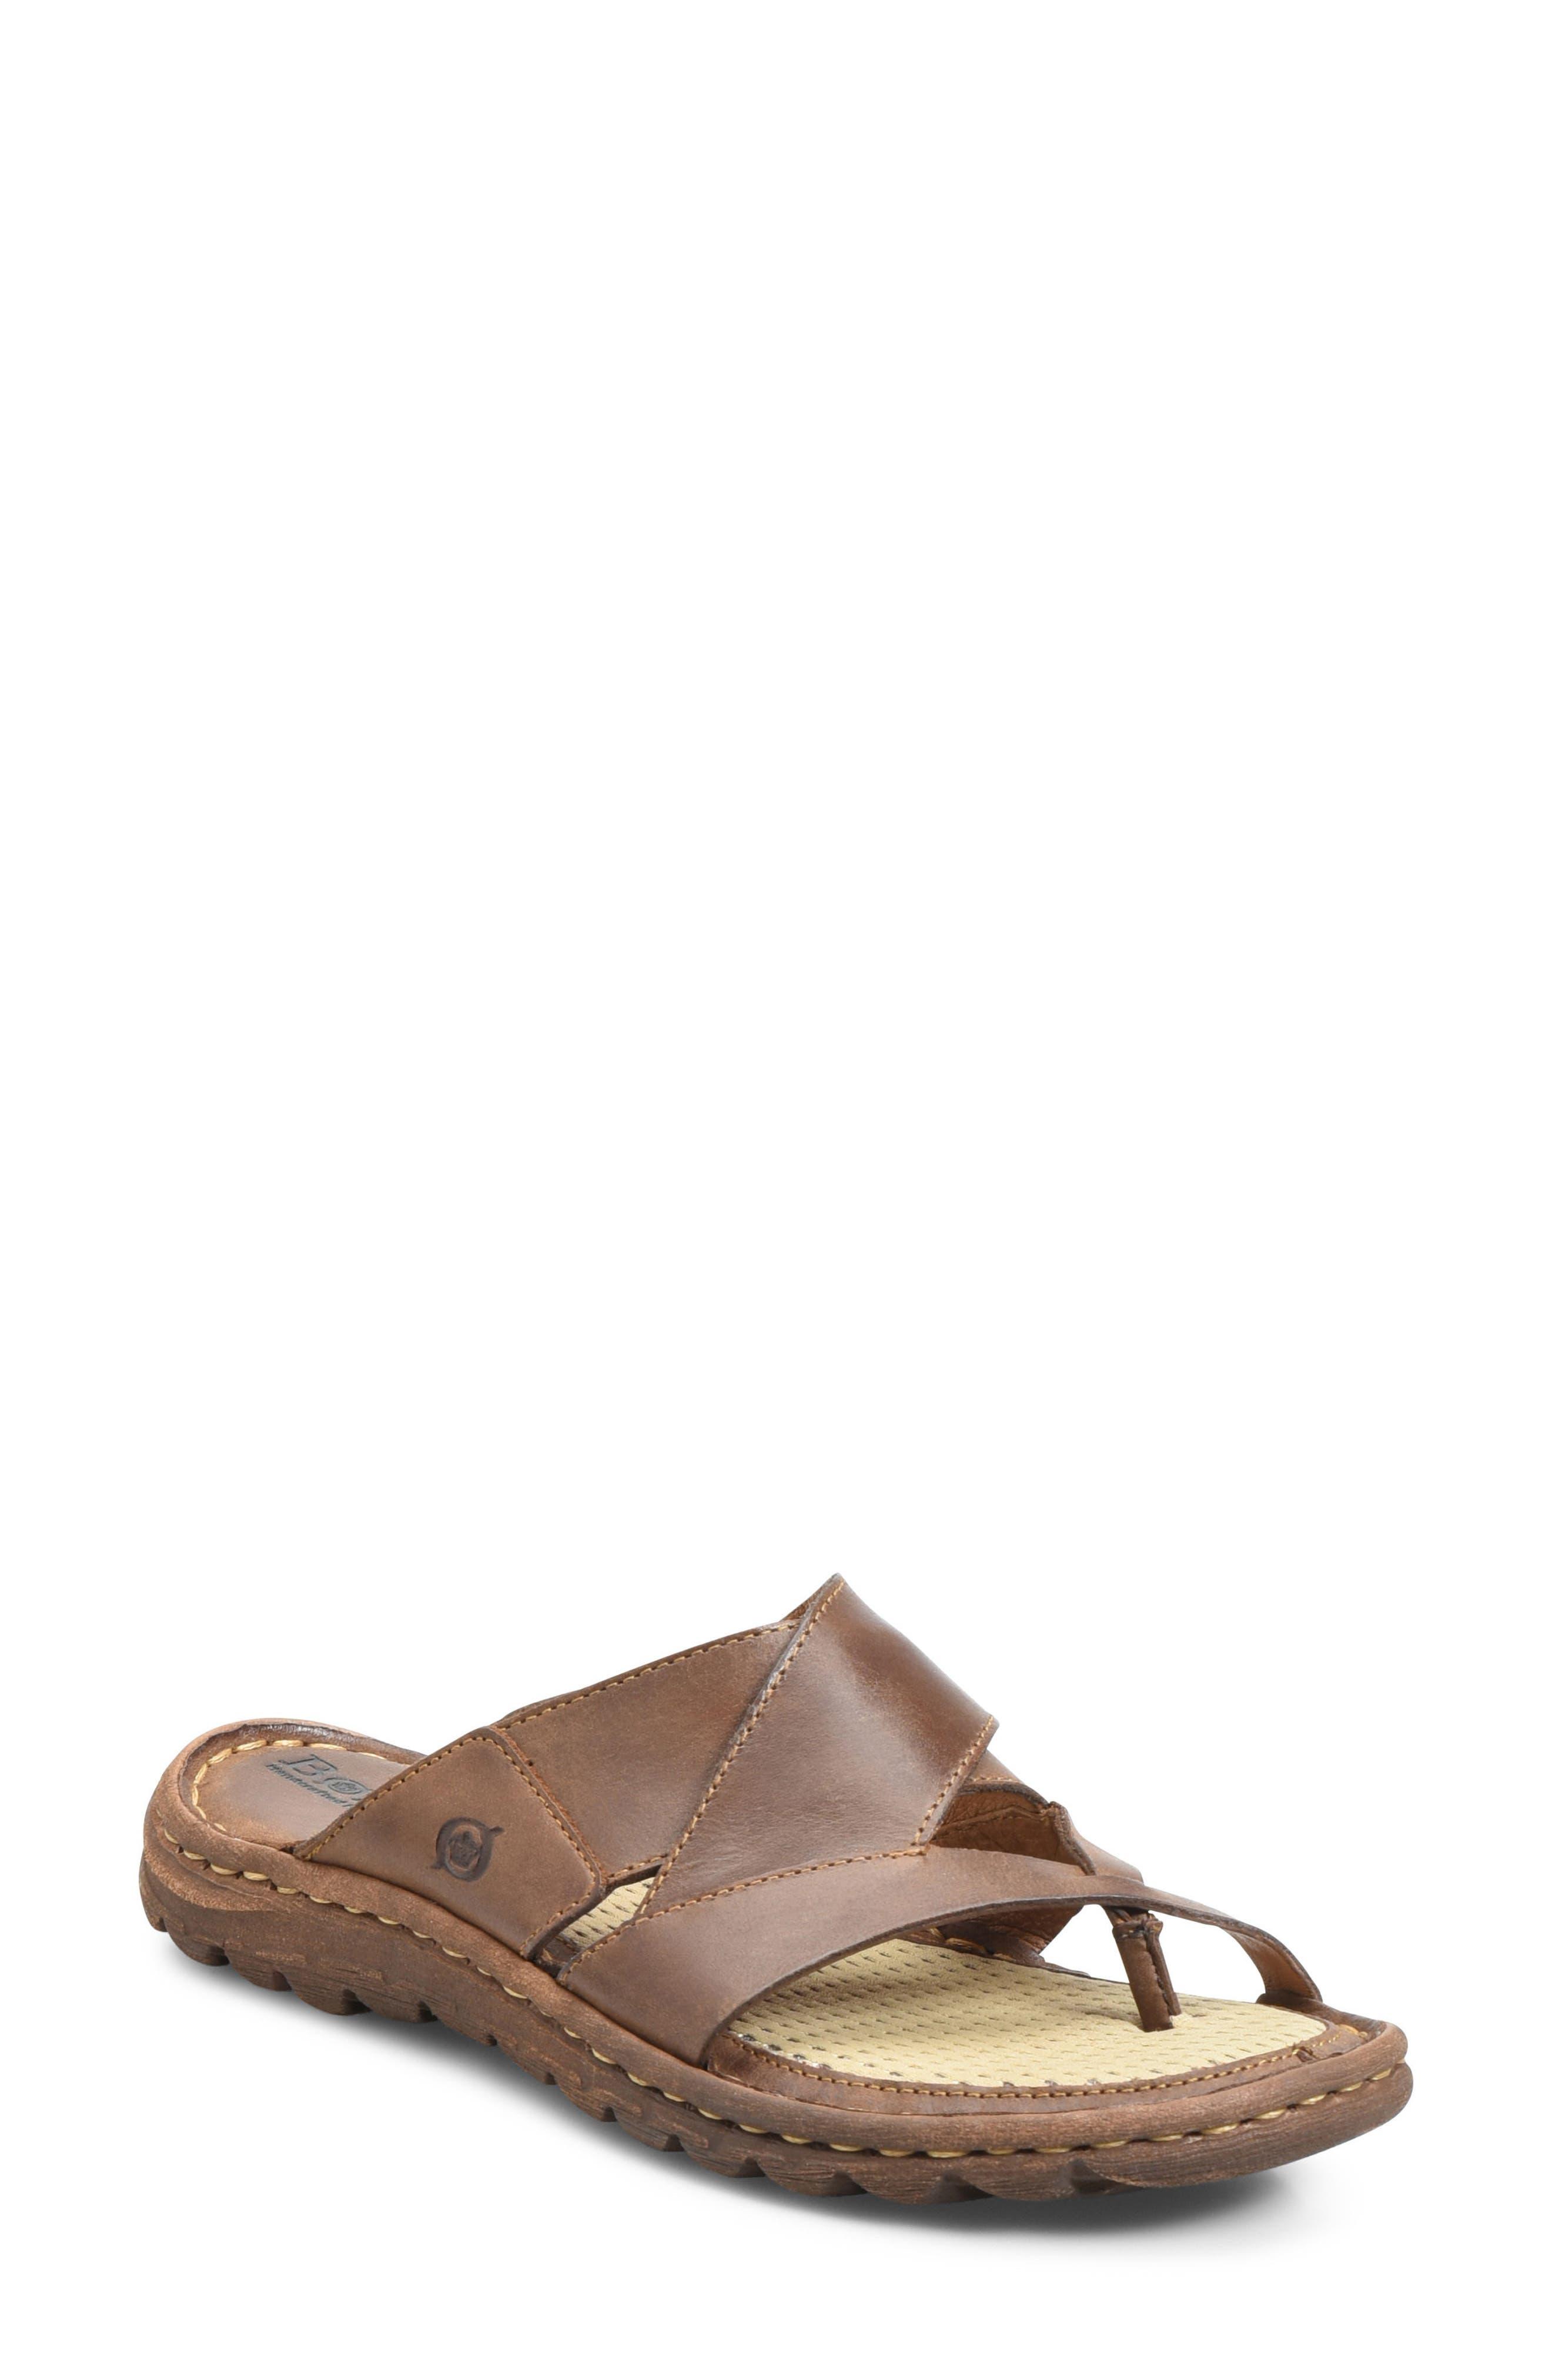 'Sorja' Leather Sandal,                         Main,                         color, DARK BROWN LEATHER